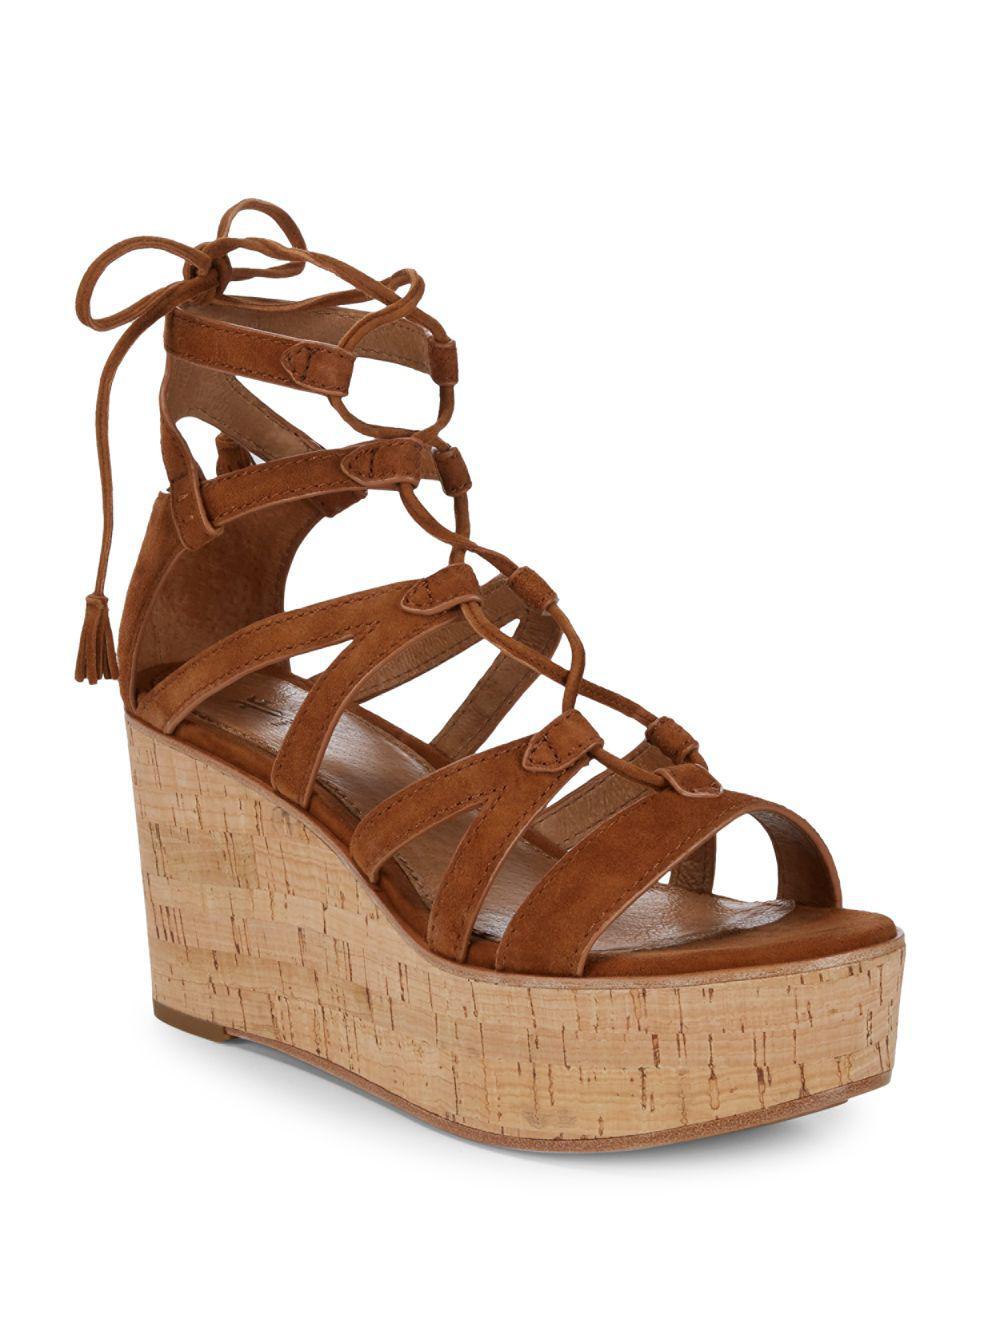 fcea273cdc819b Lyst - Frye Heather Suede Gladiator Wedge Sandals in Brown - Save 54%